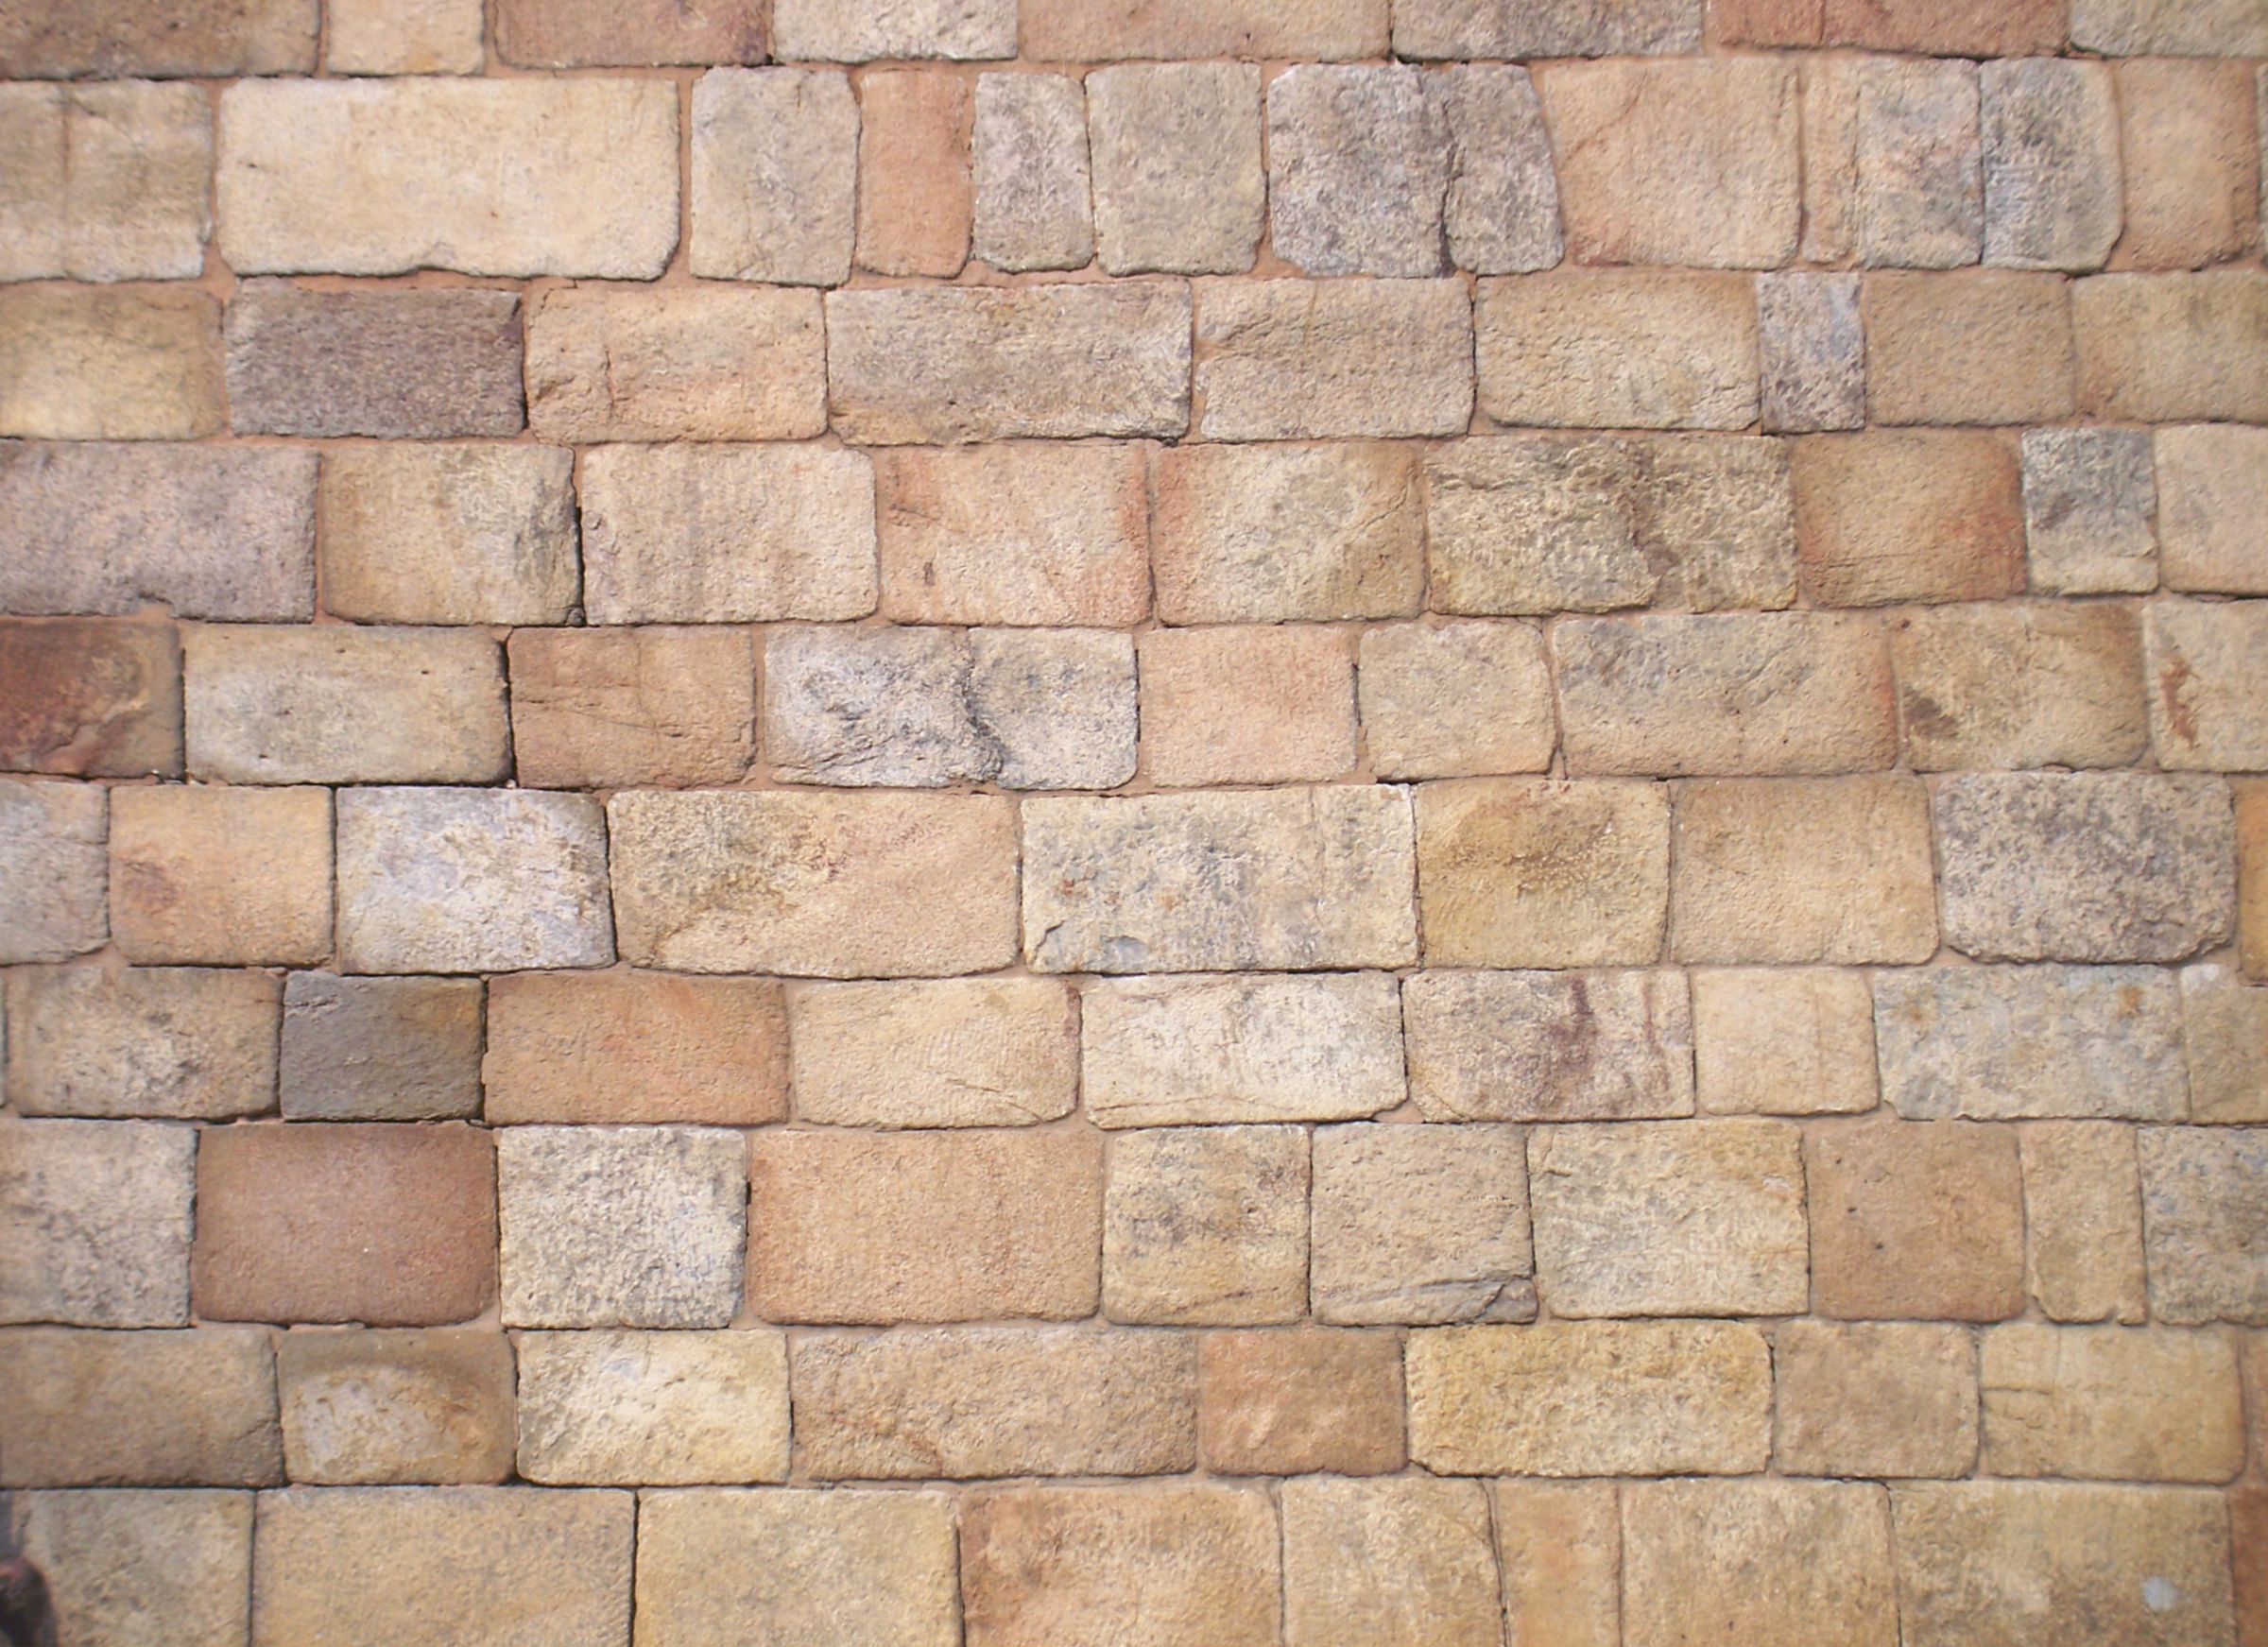 Stone Block Wall Terraria : Joints de pierre o p ravalement